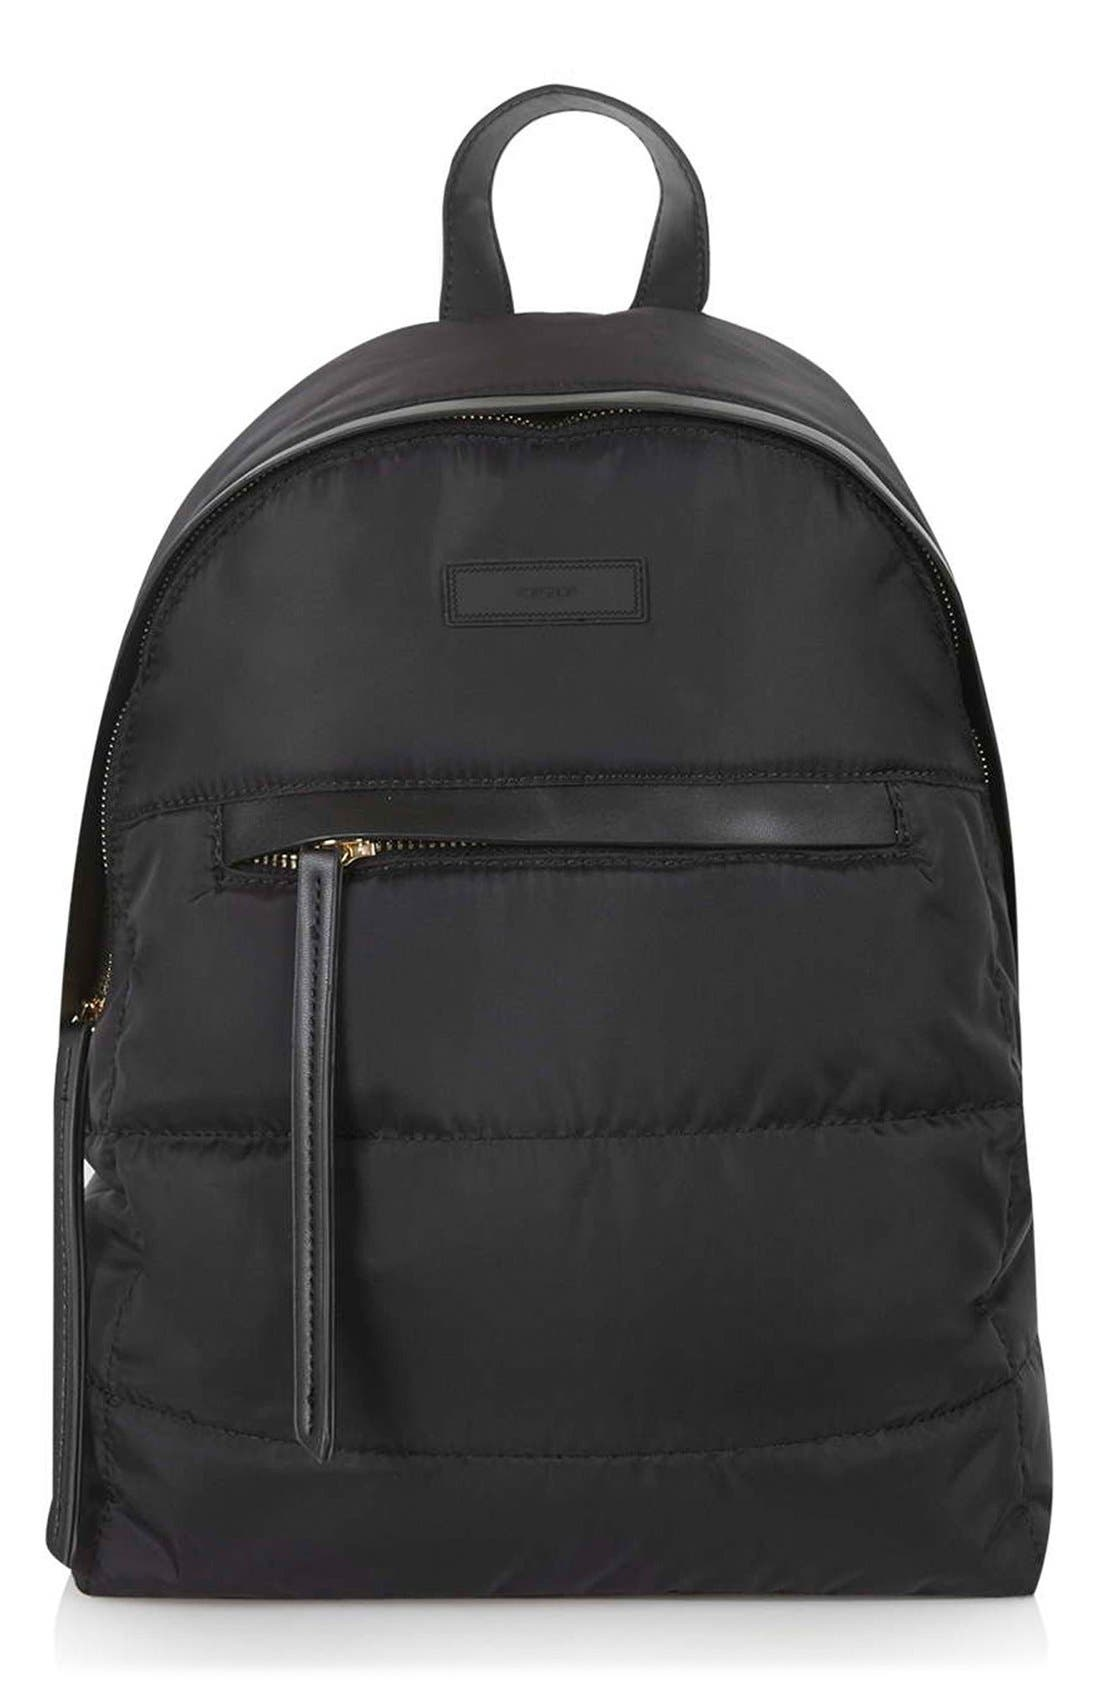 NylonBackpack,                         Main,                         color, Black